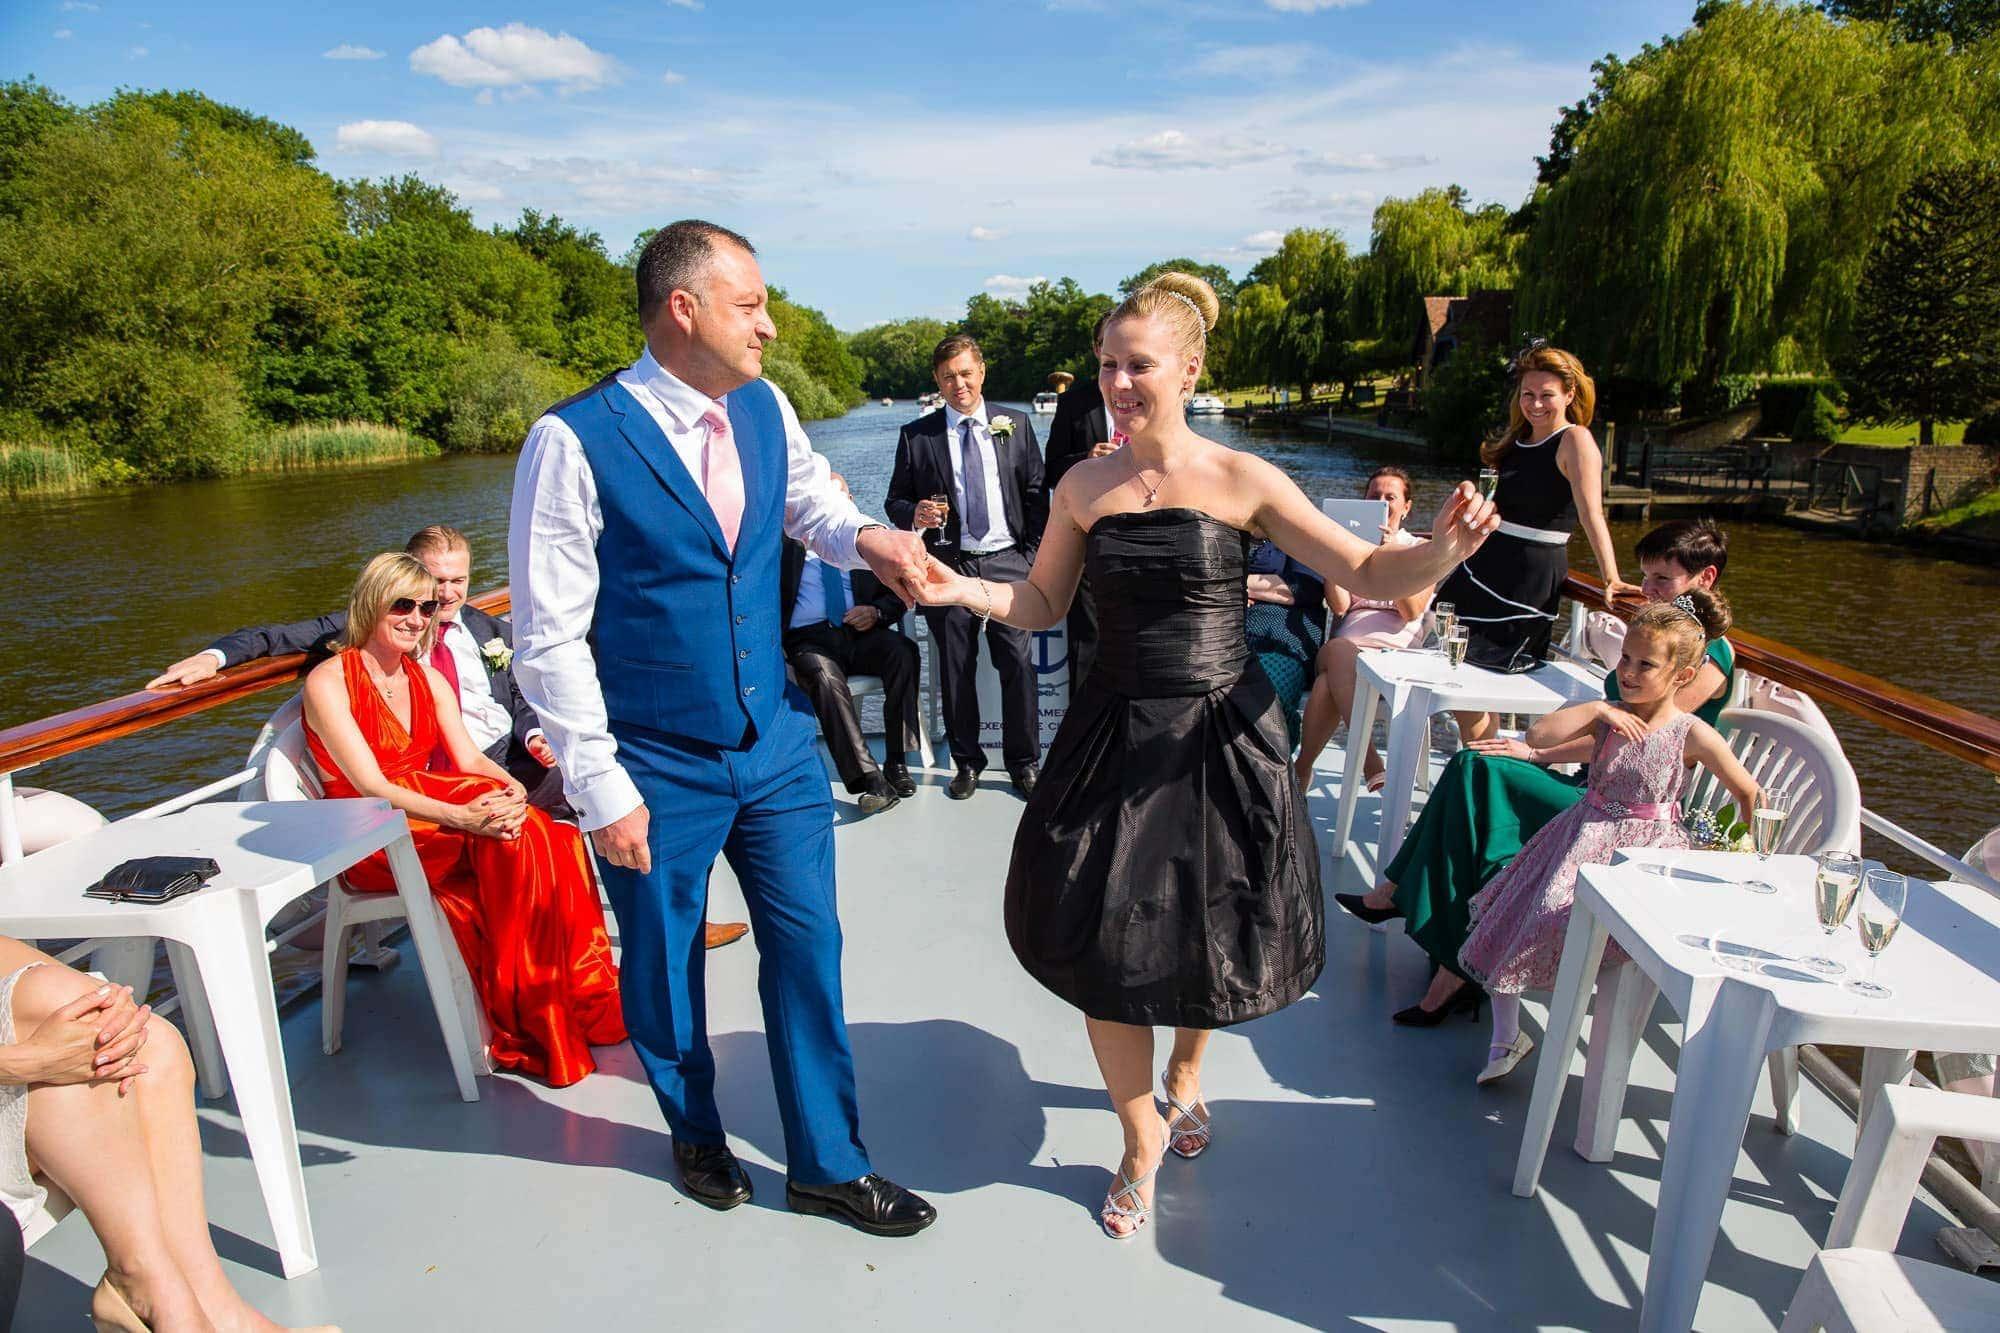 Dancing onboard boat at Oakley Court Wedding